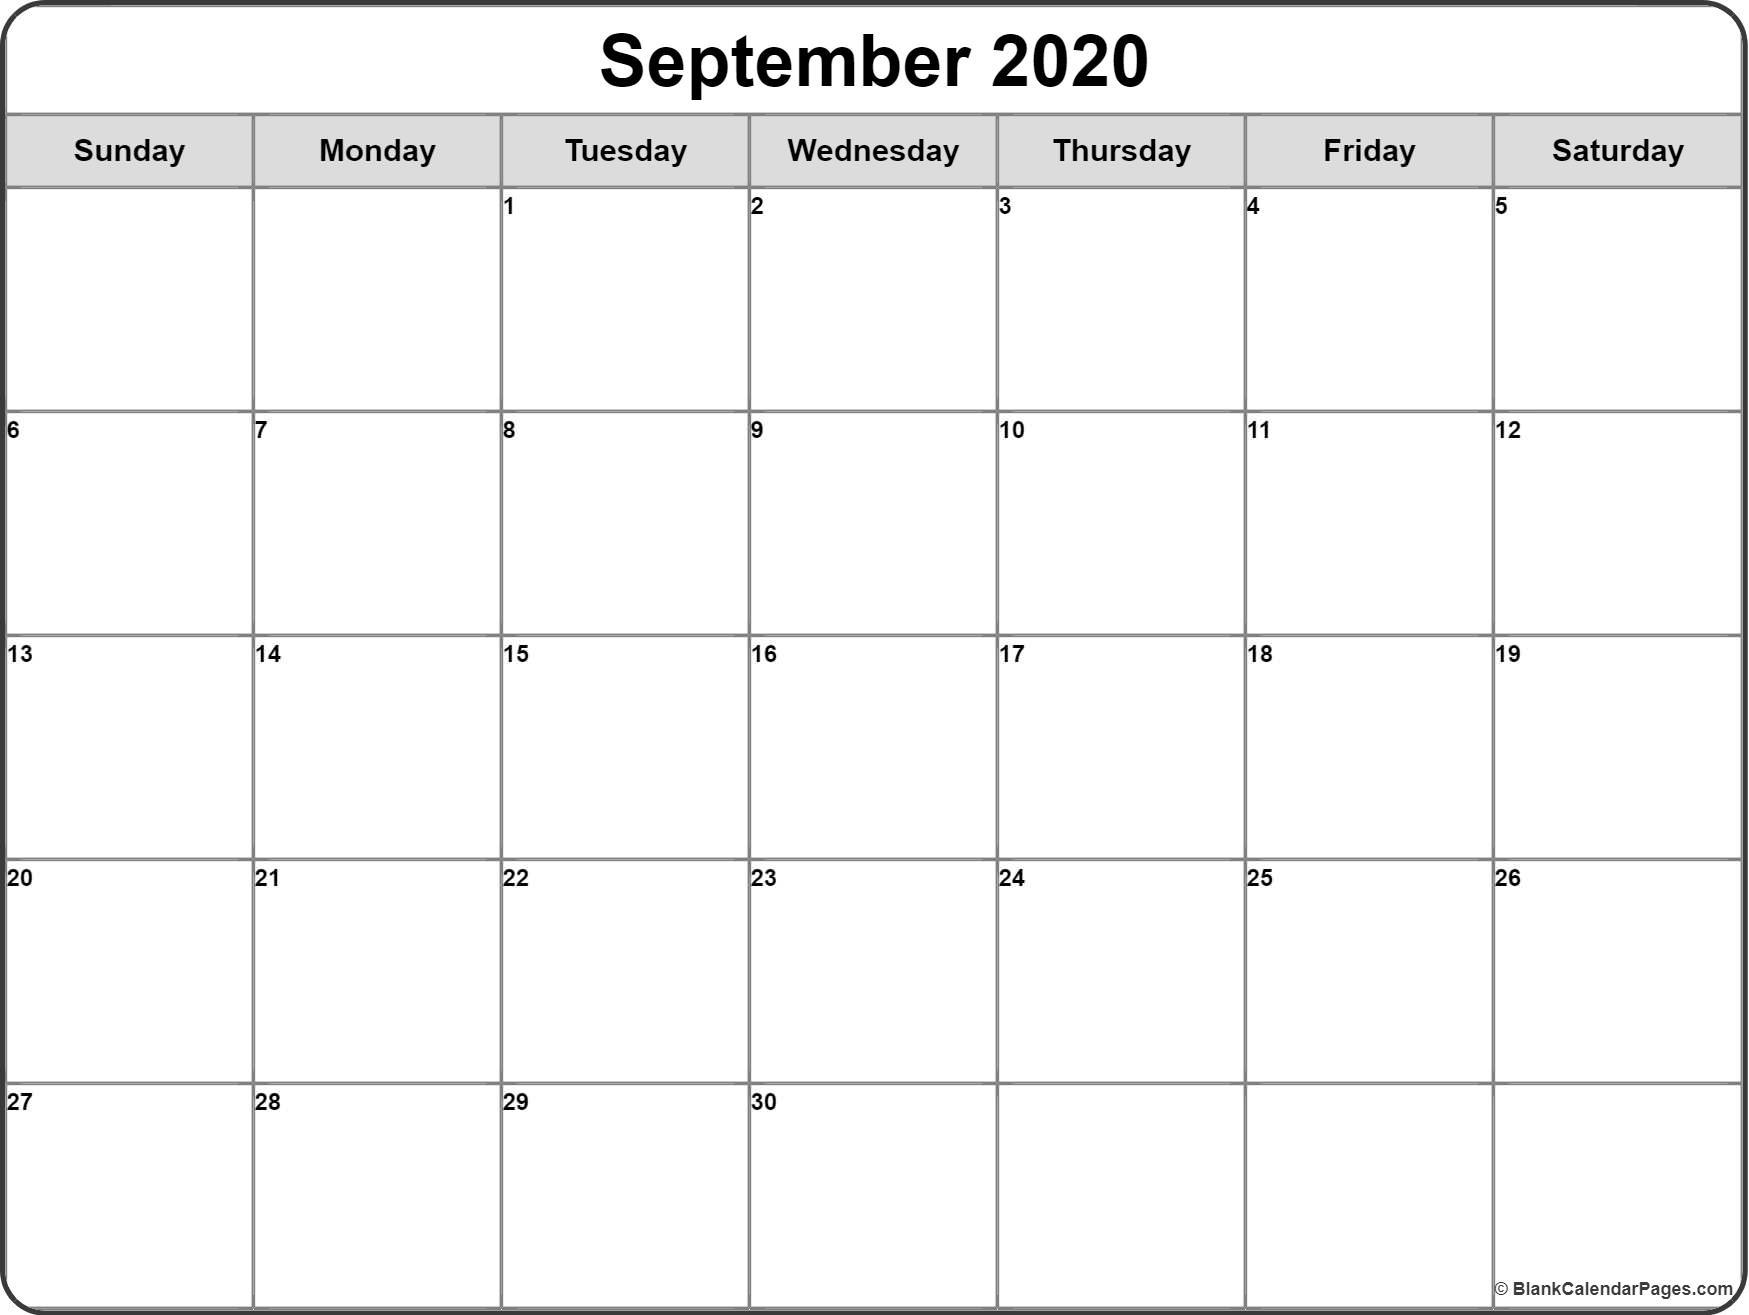 September 2020 Calendar | Free Printable Monthly Calendars for Printable Monthly Calendar 2020 Free